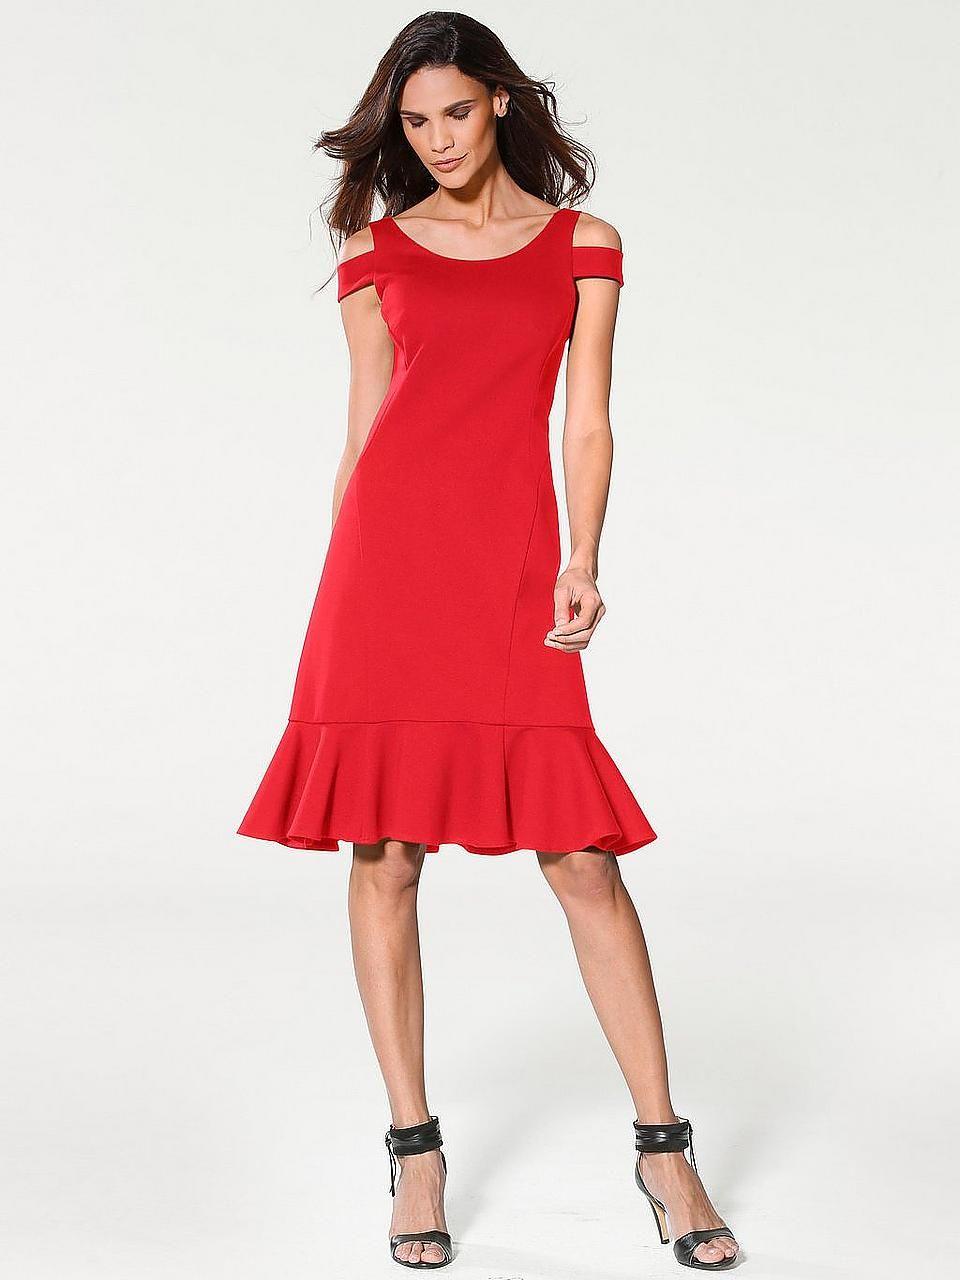 Baur kleid rot